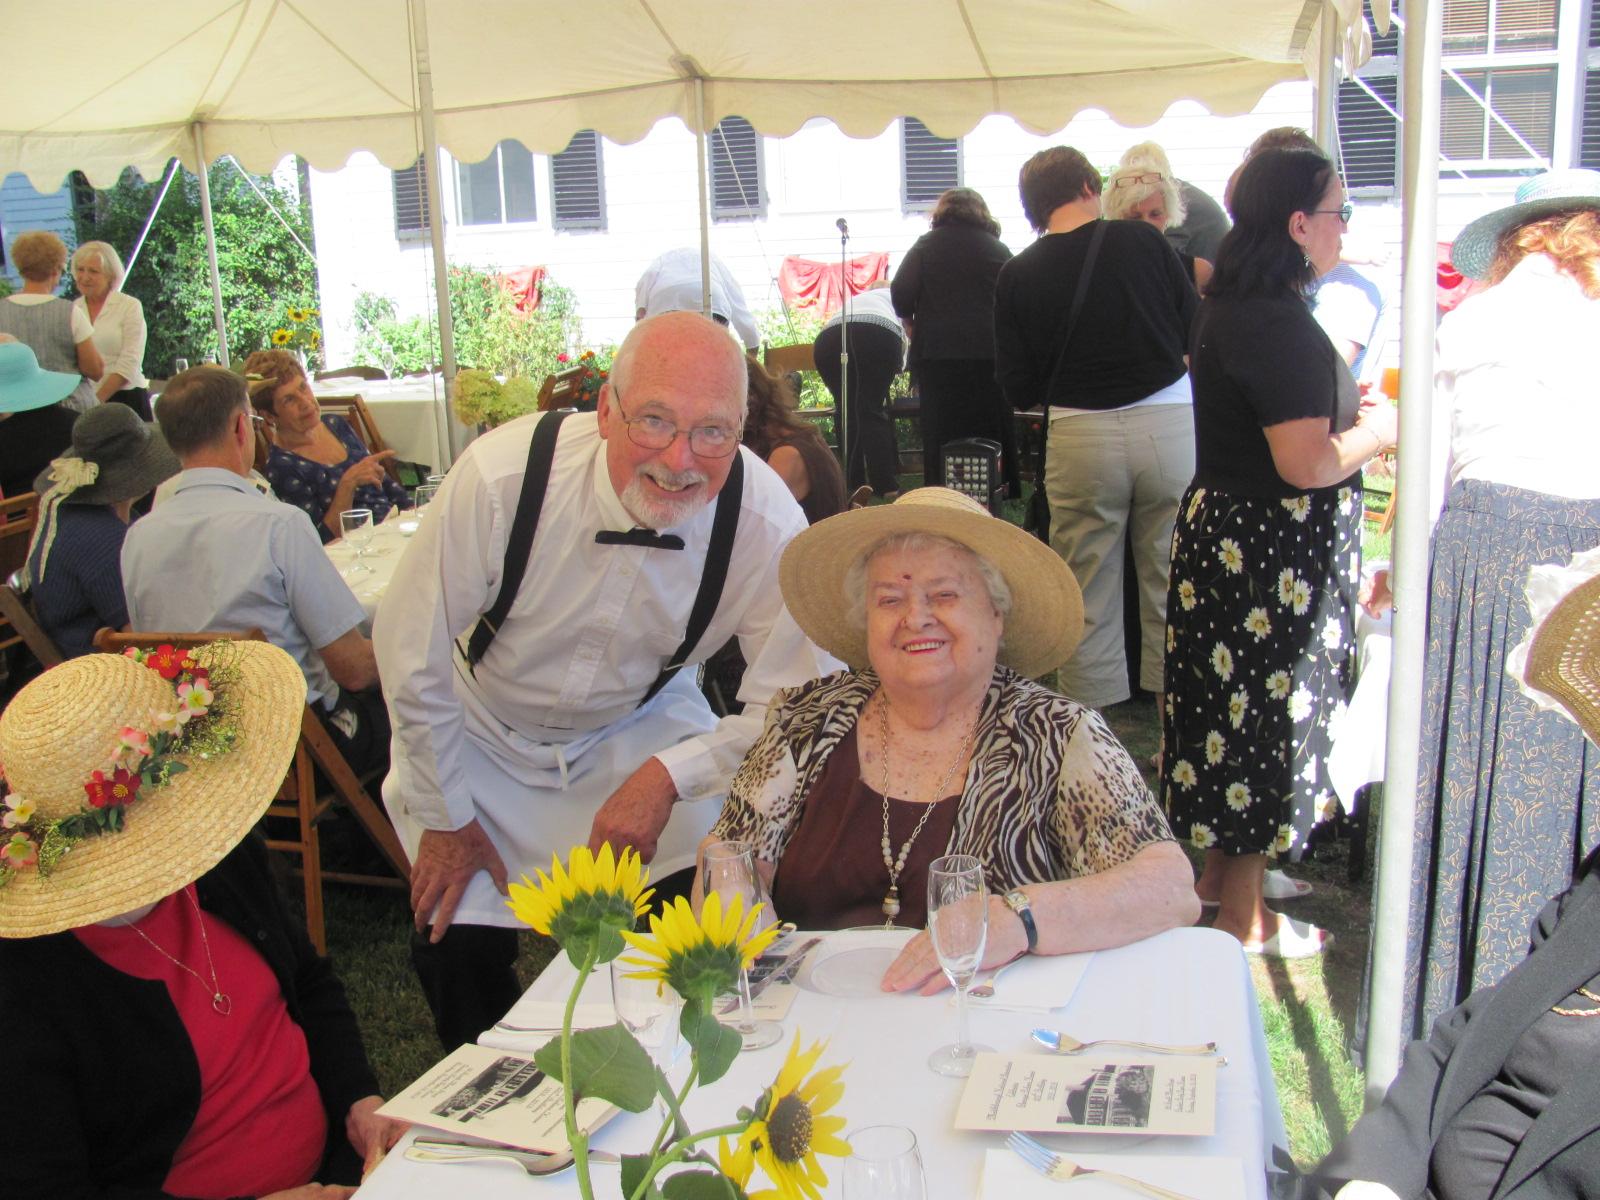 Historical_Society_Garden_Party_2013_--_Doug_Vantran_and_Jessie_Brennan.jpg